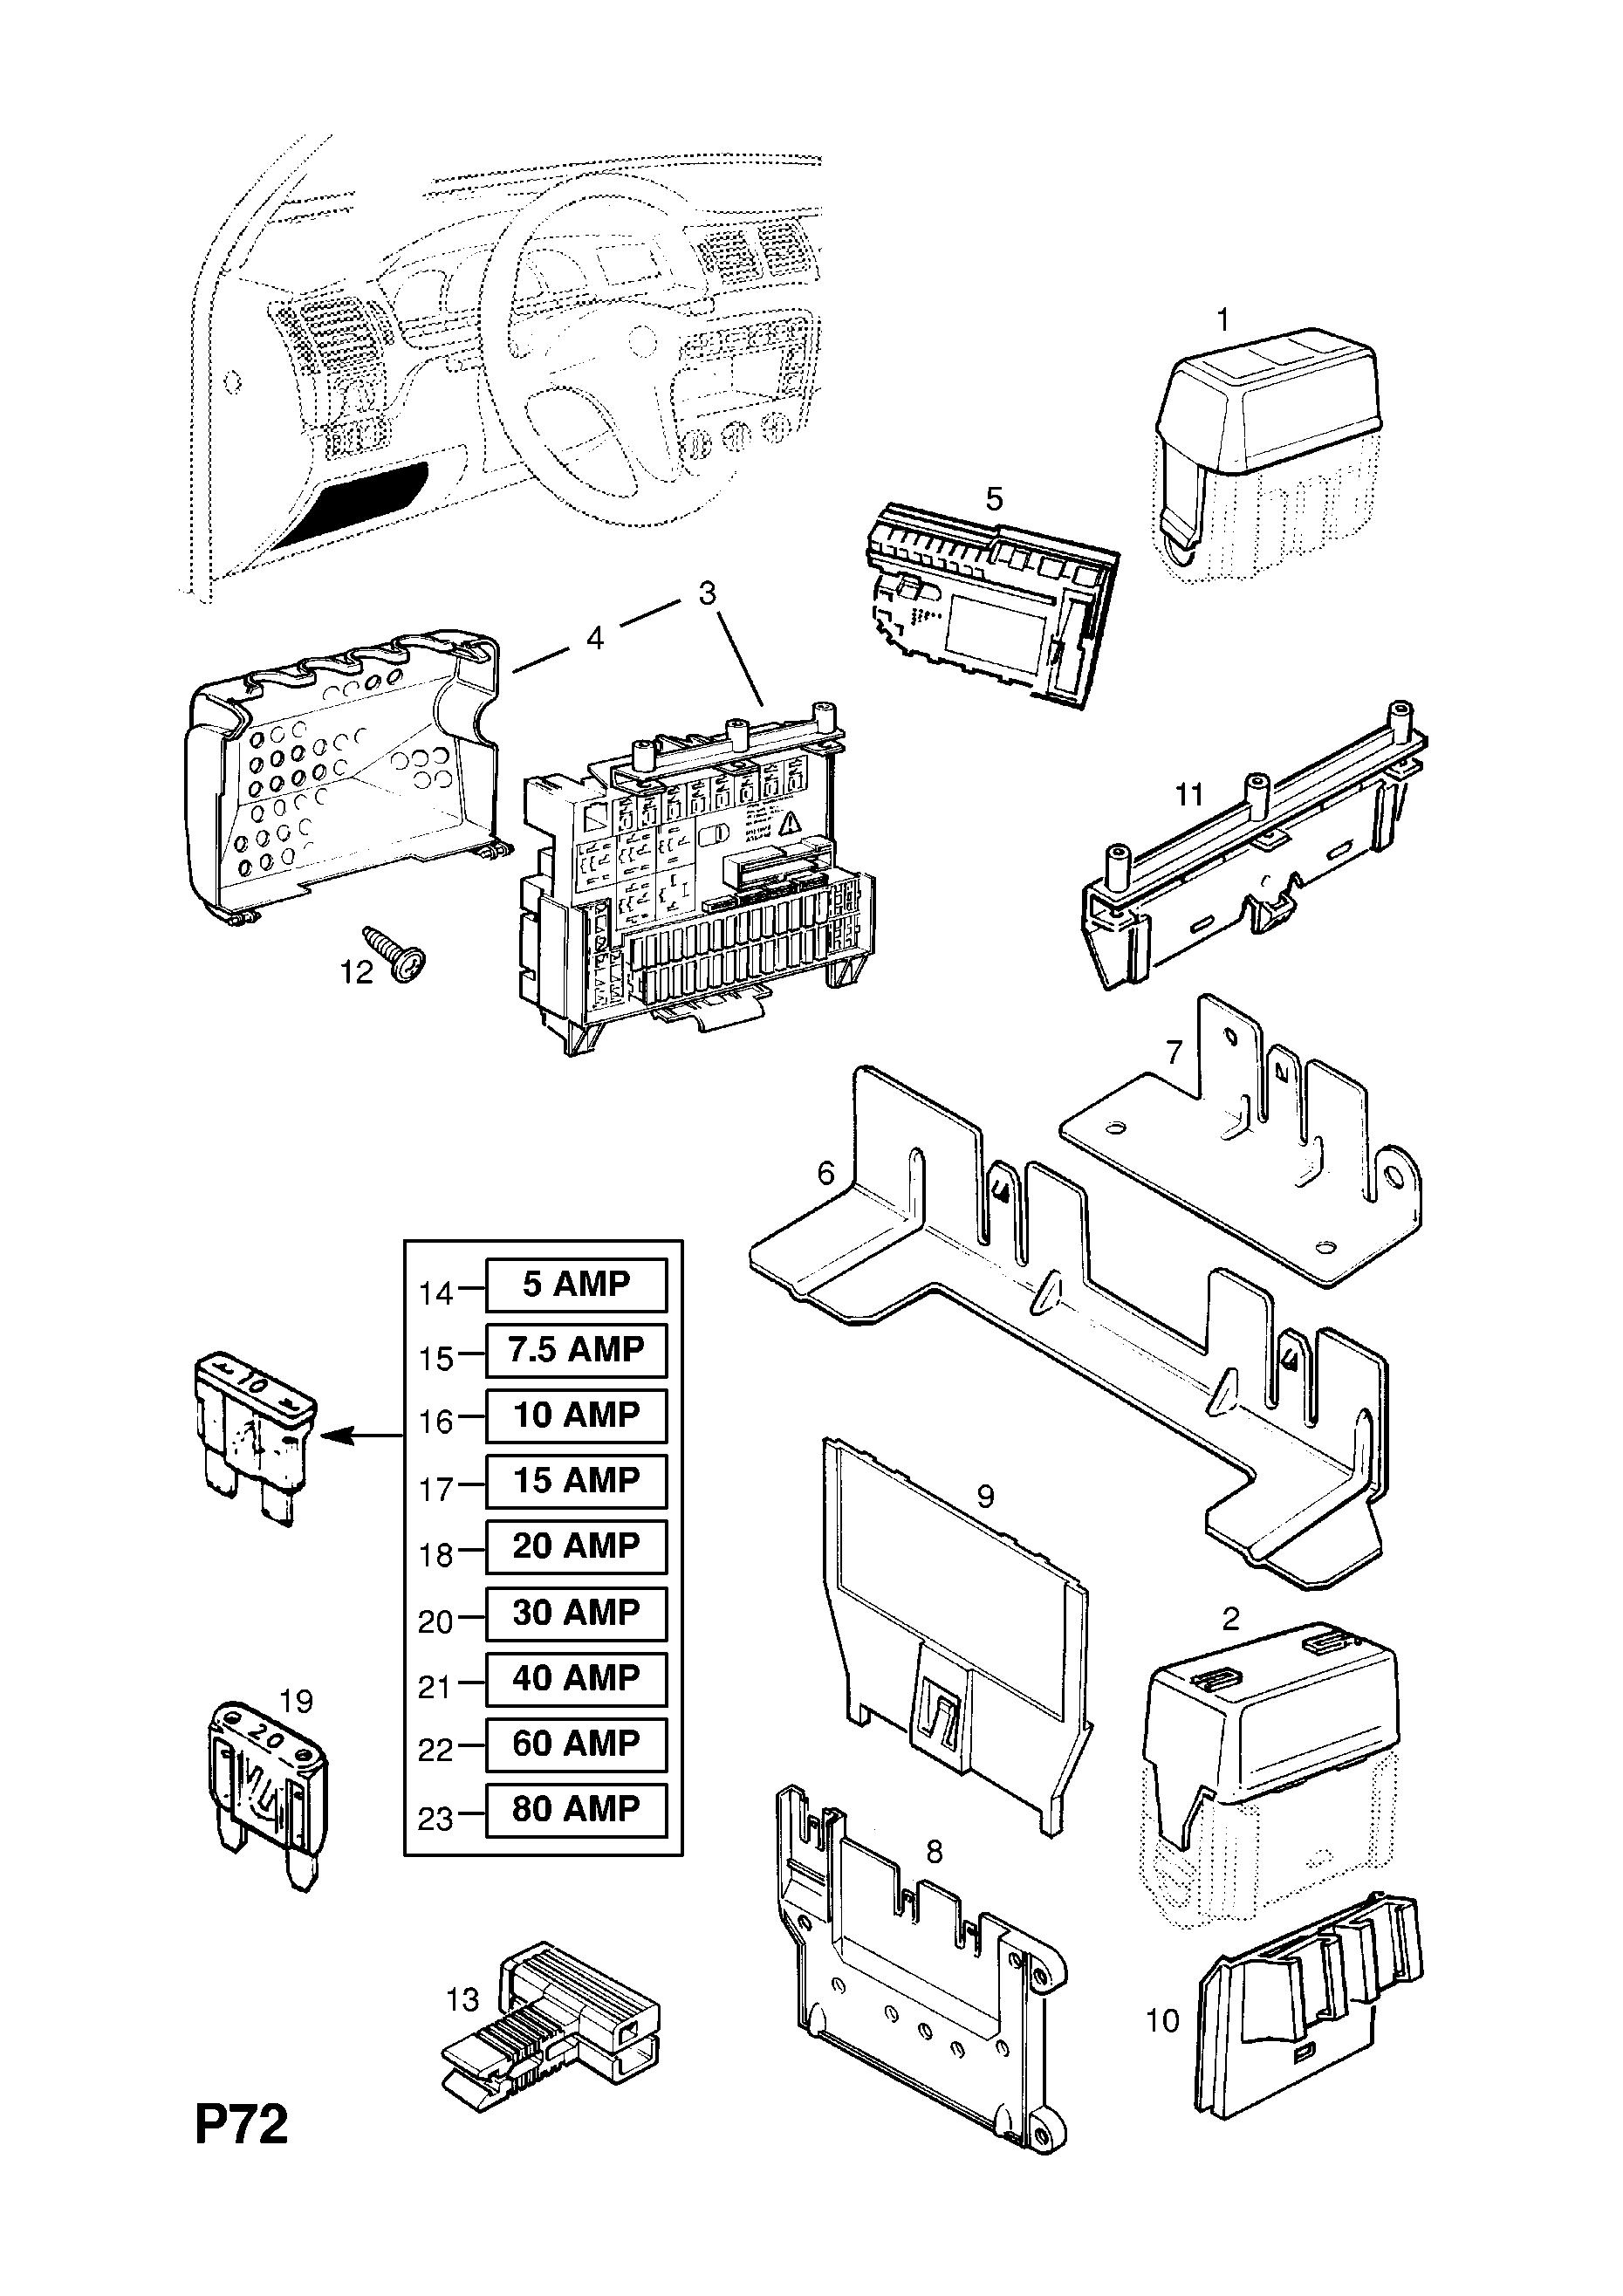 Epc Fuse Box Archive Of Automotive Wiring Diagram Opel Gt Vectra B U003e Online Nemigaparts Com Rh